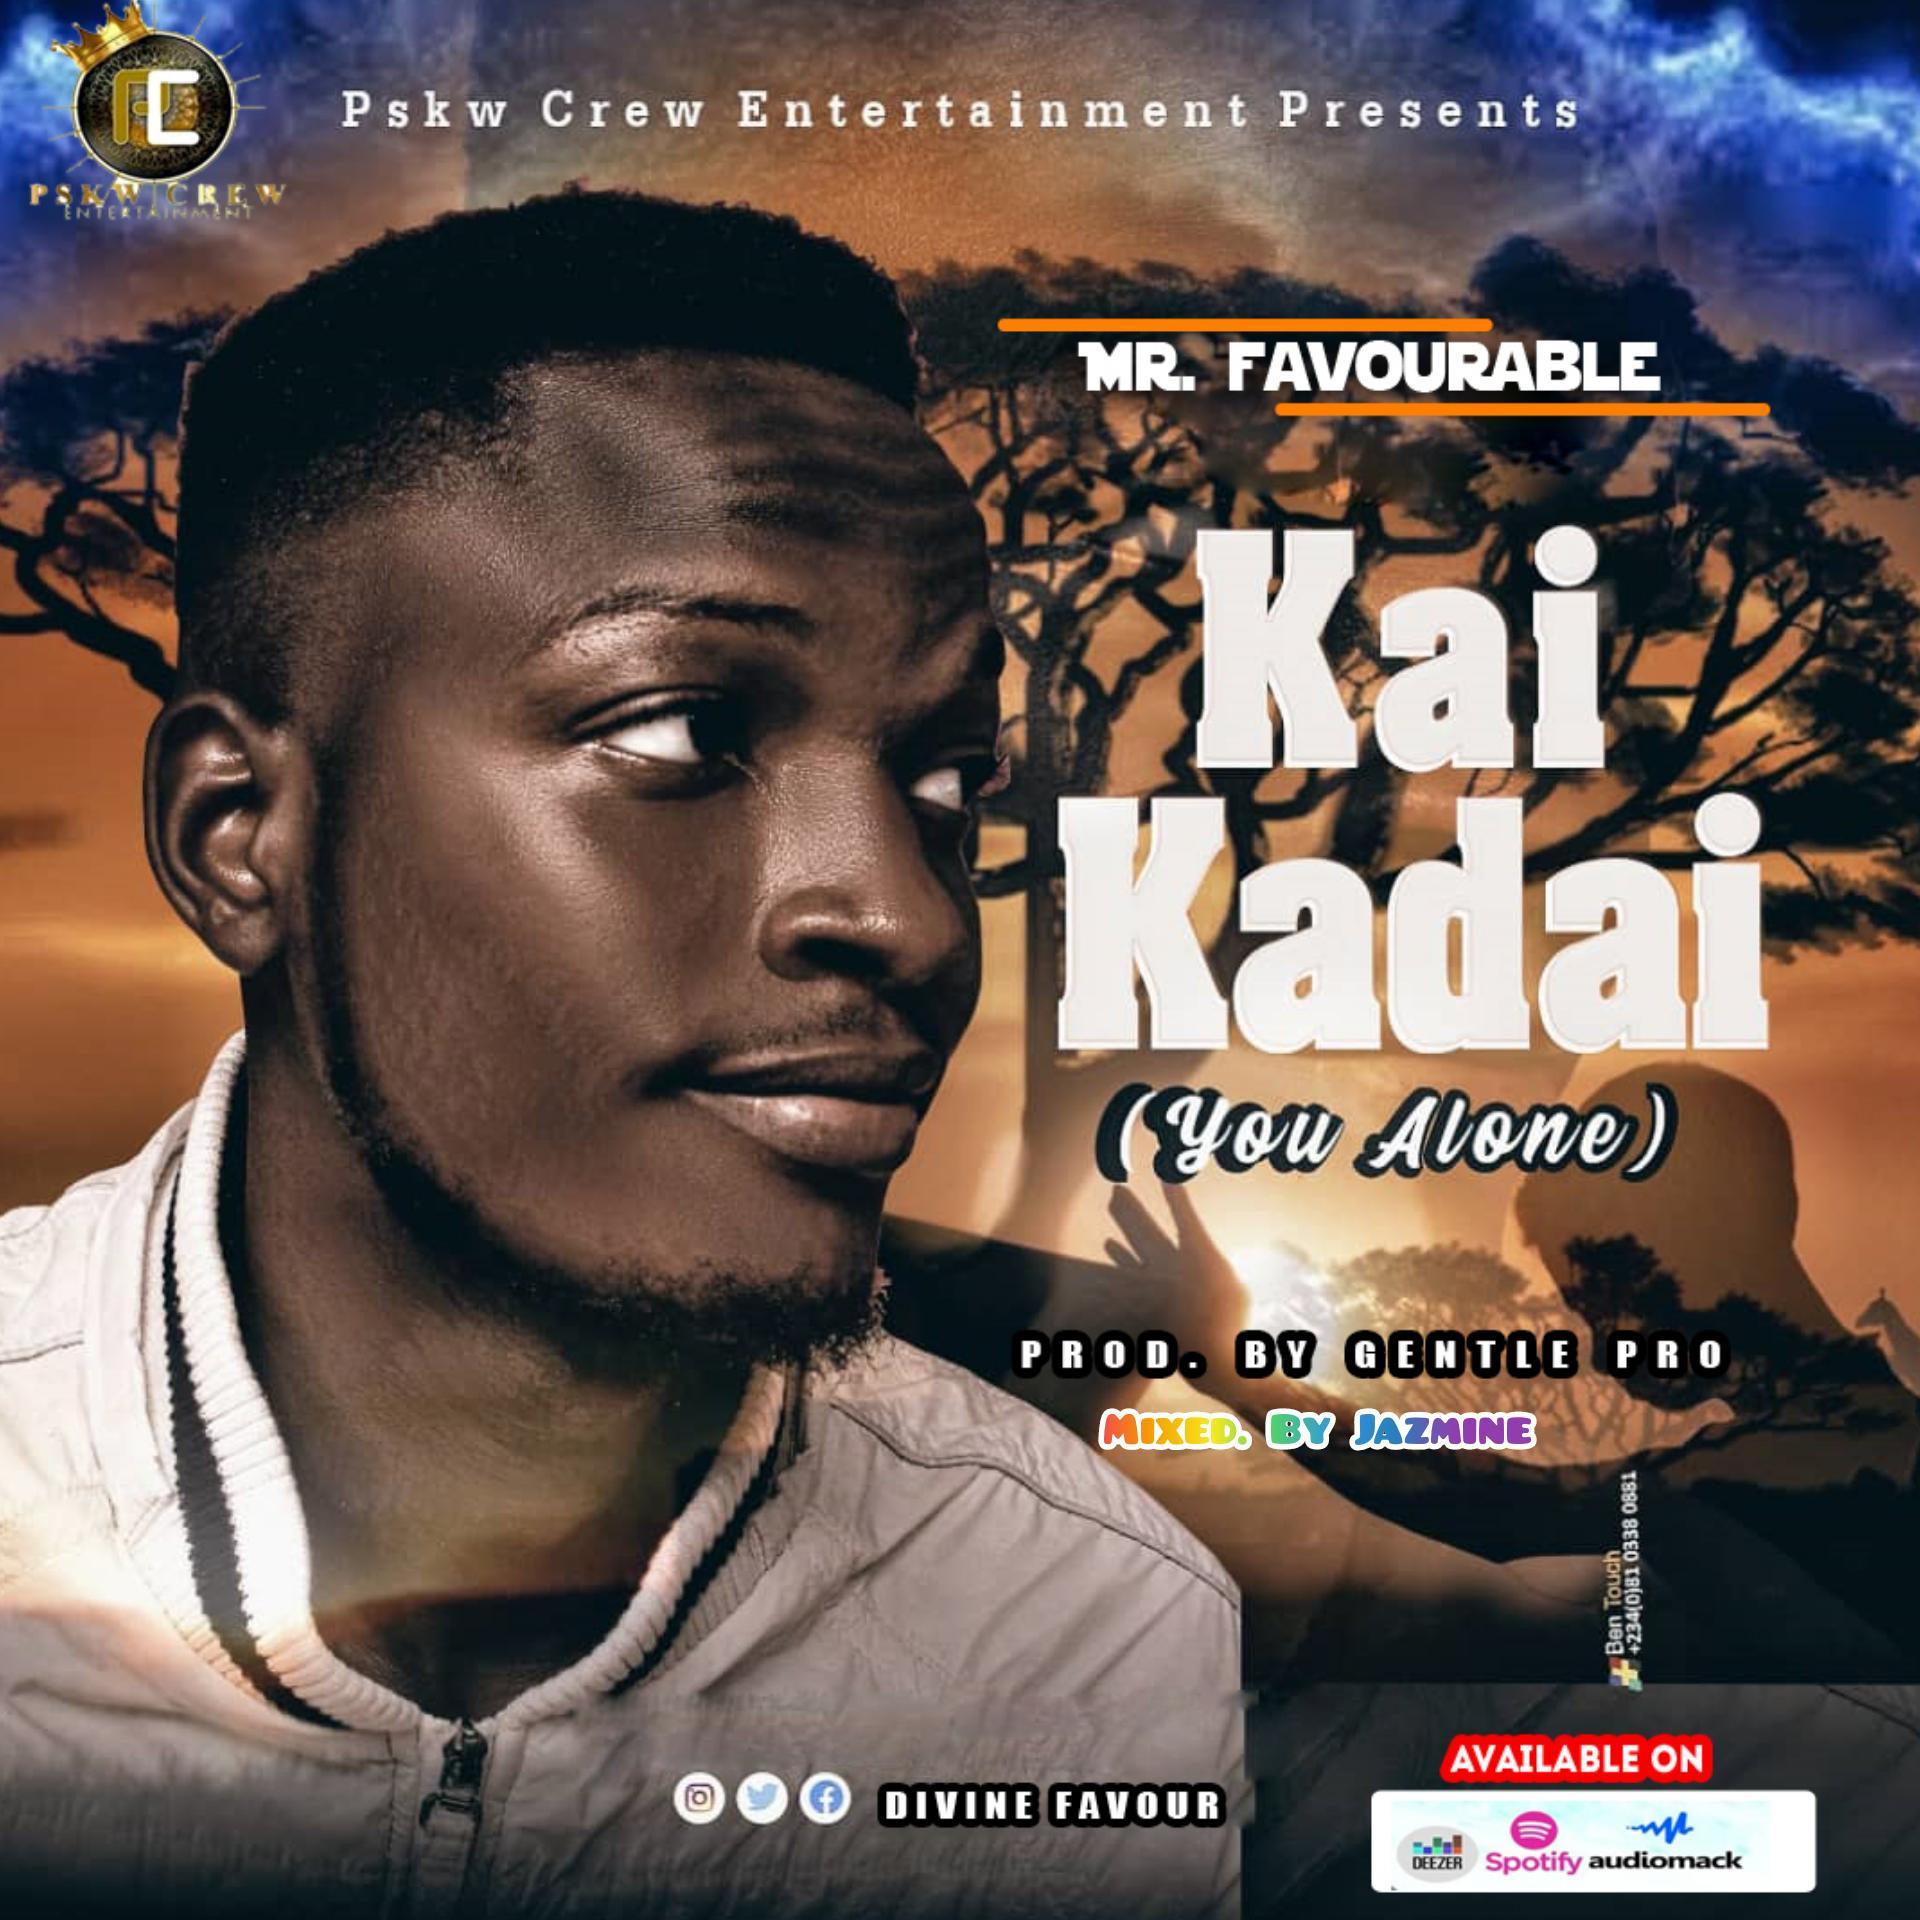 Mr Favourable – Kai Kadai(You Alone) (Prod by Gentle Pro)